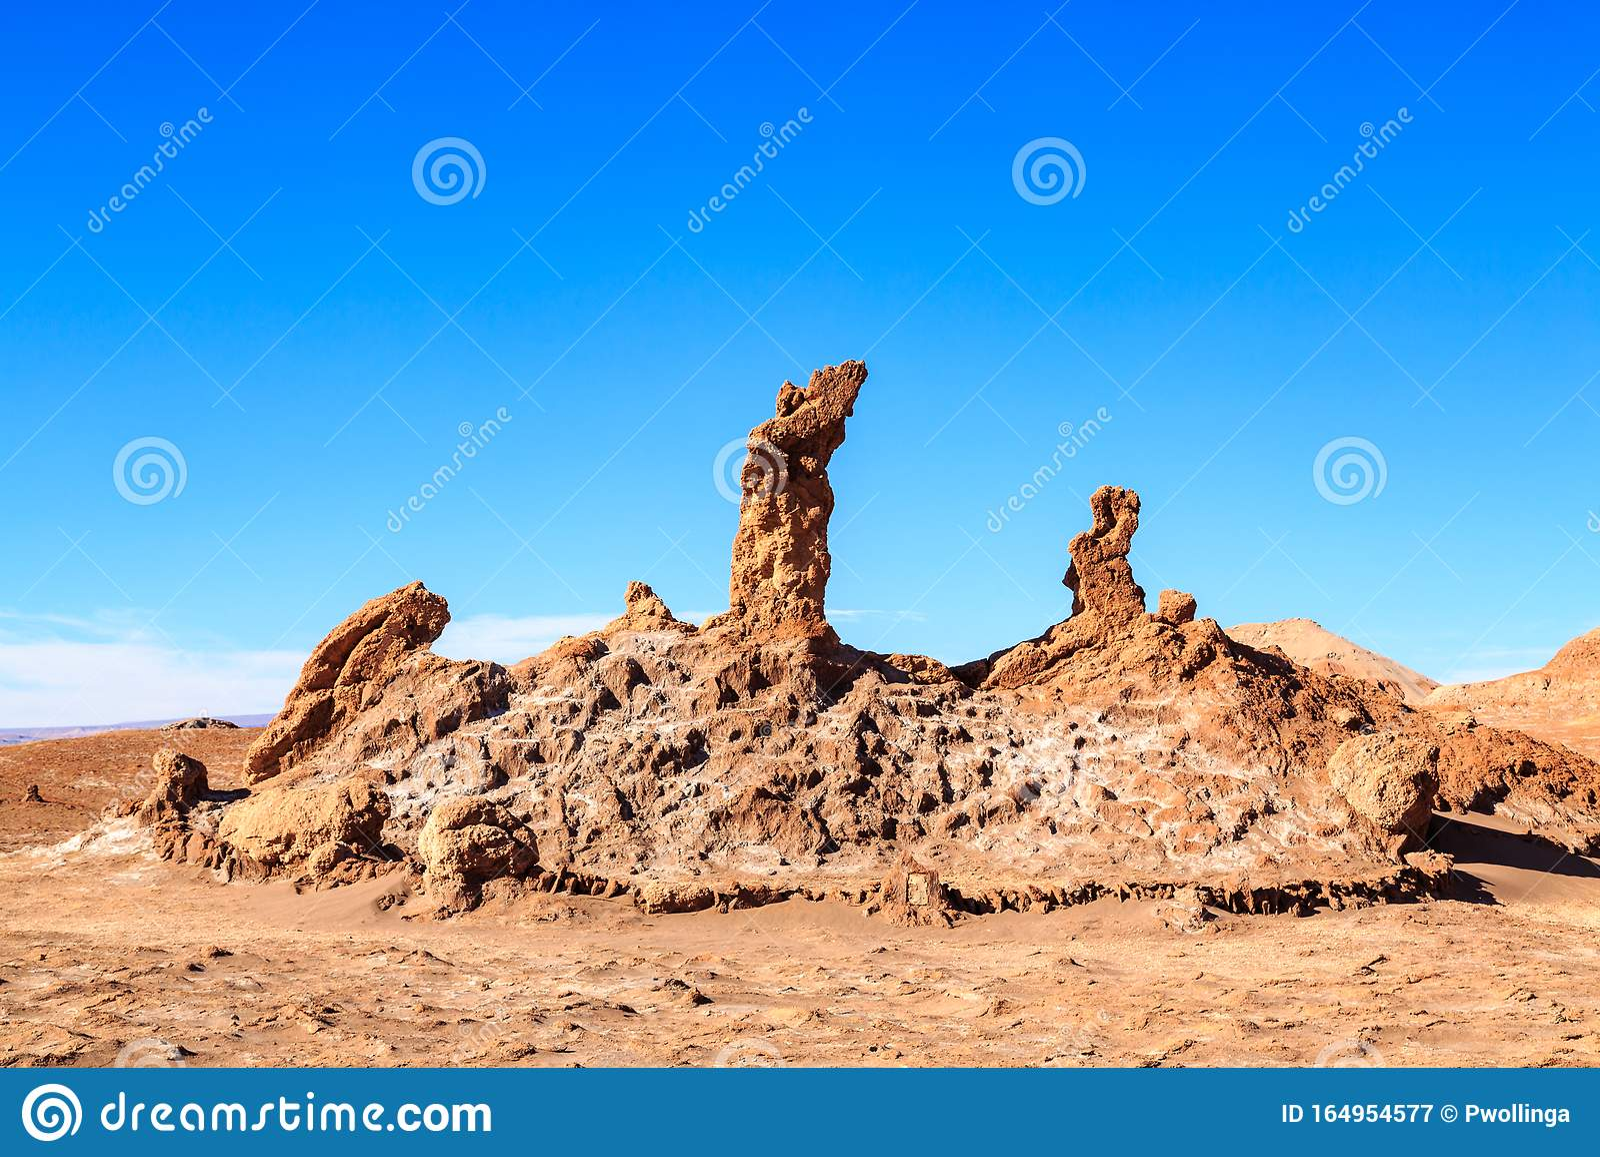 Tres Marias Near The Moon Valley Valle De La Luna In The Atacama Desert Chile Stock Image Image Of Stone Pedro 164954577